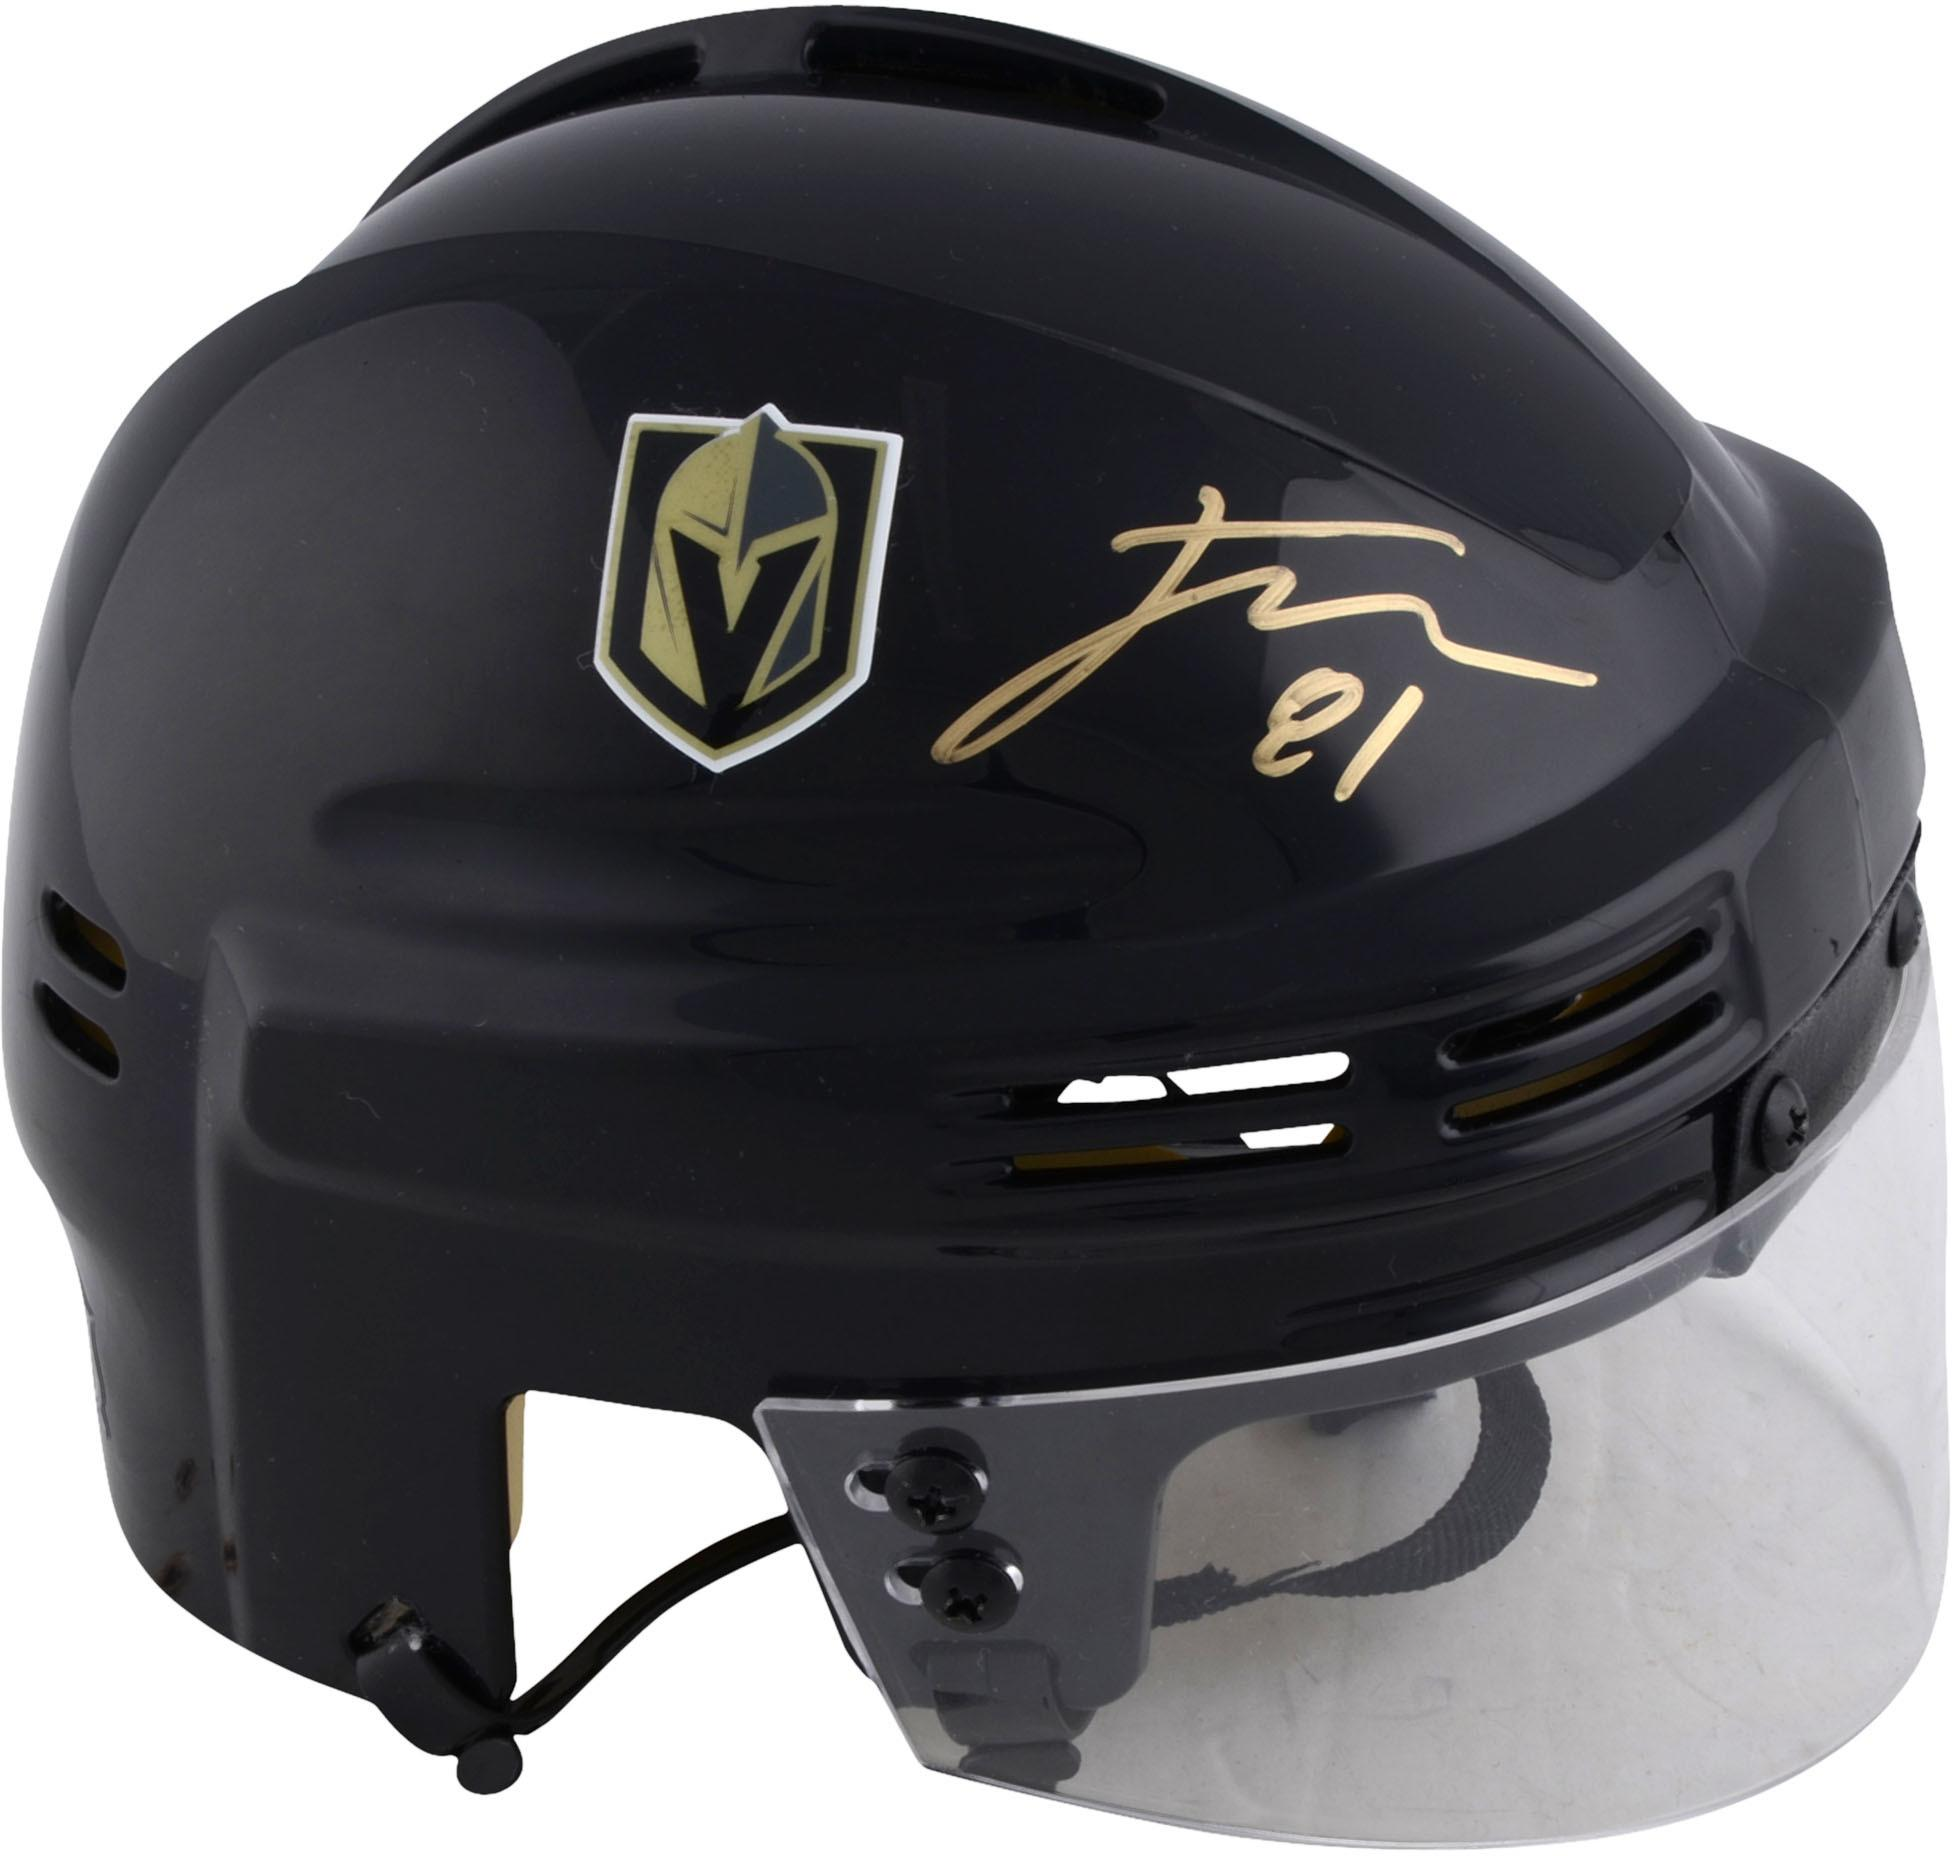 Jonathan Marchessault Vegas Golden Knights Autographed Black Mini Helmet -  Fanatics Authentic Certified - Walmart.com 79277915a